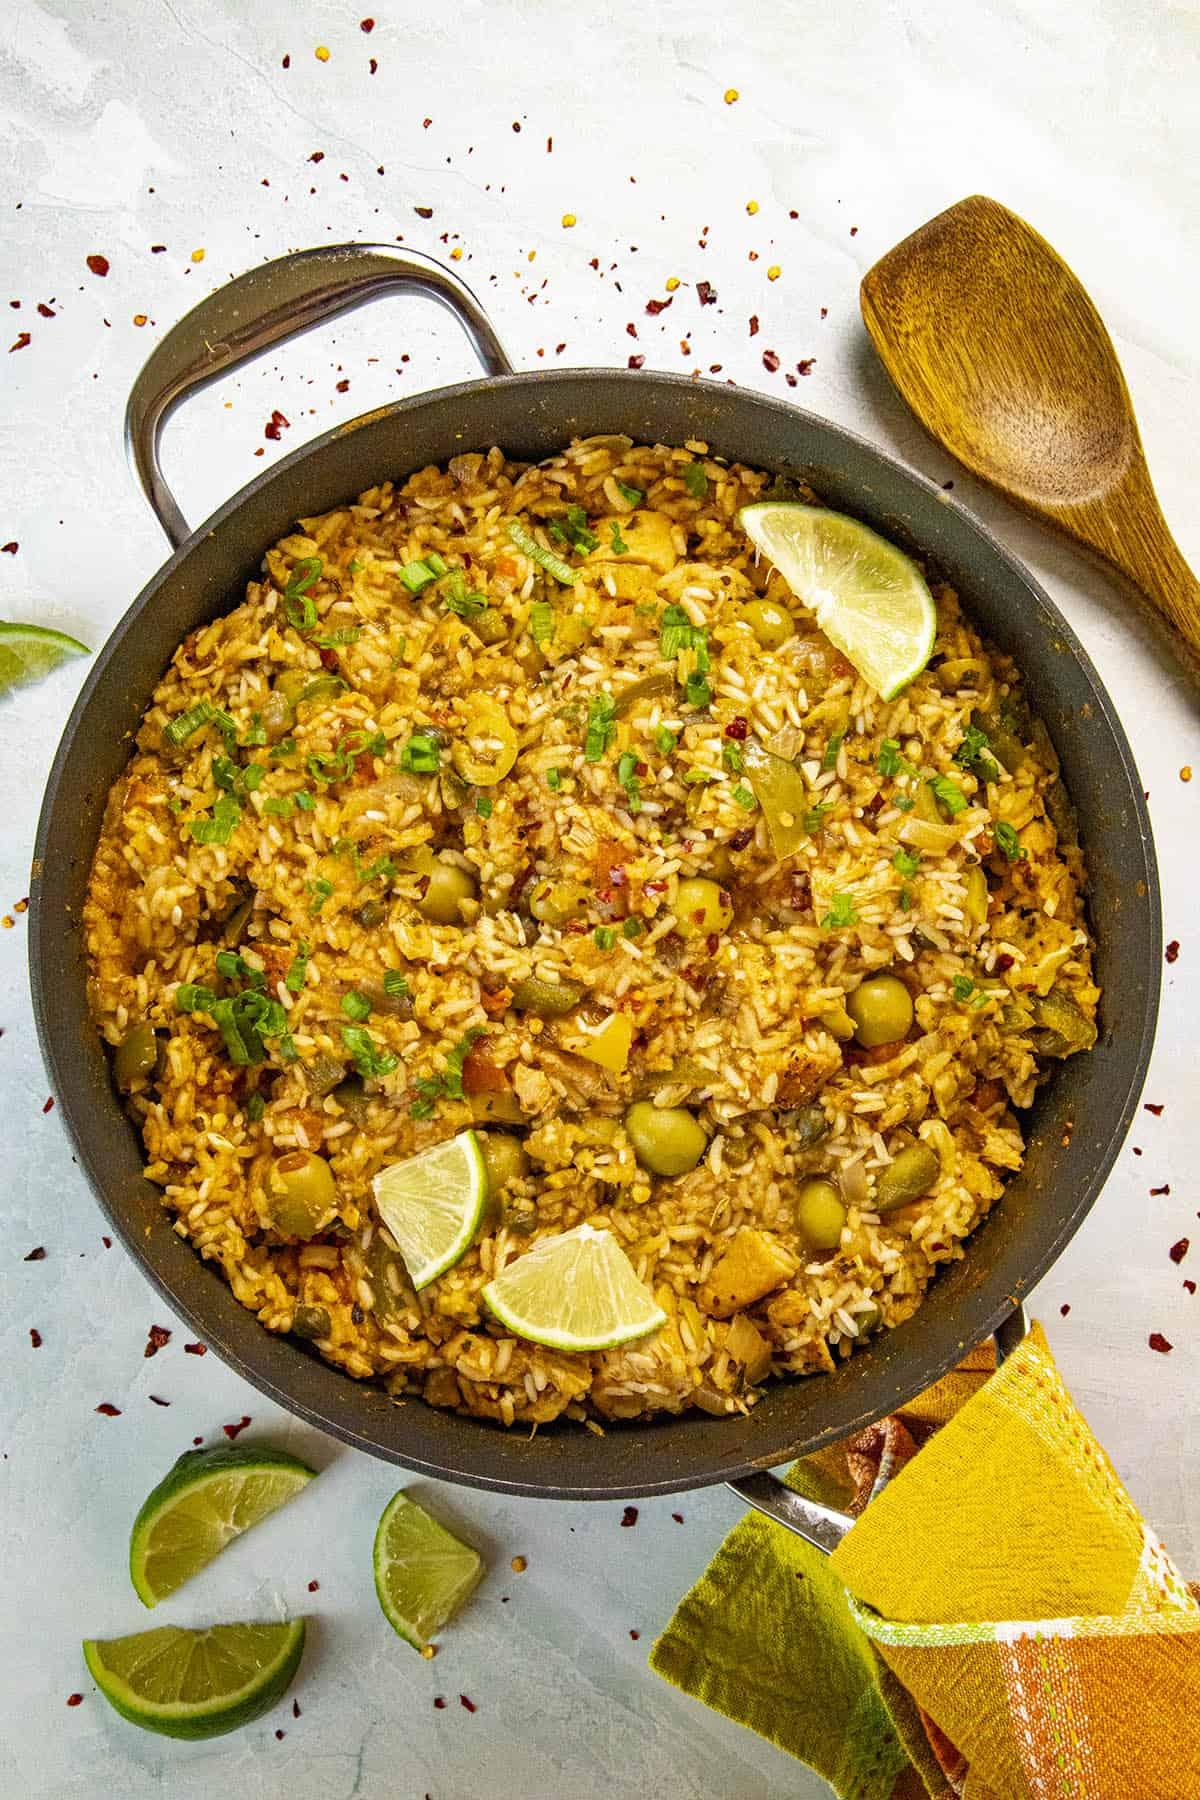 Puerto Rican Arroz con Pollo in a pan, ready to serve